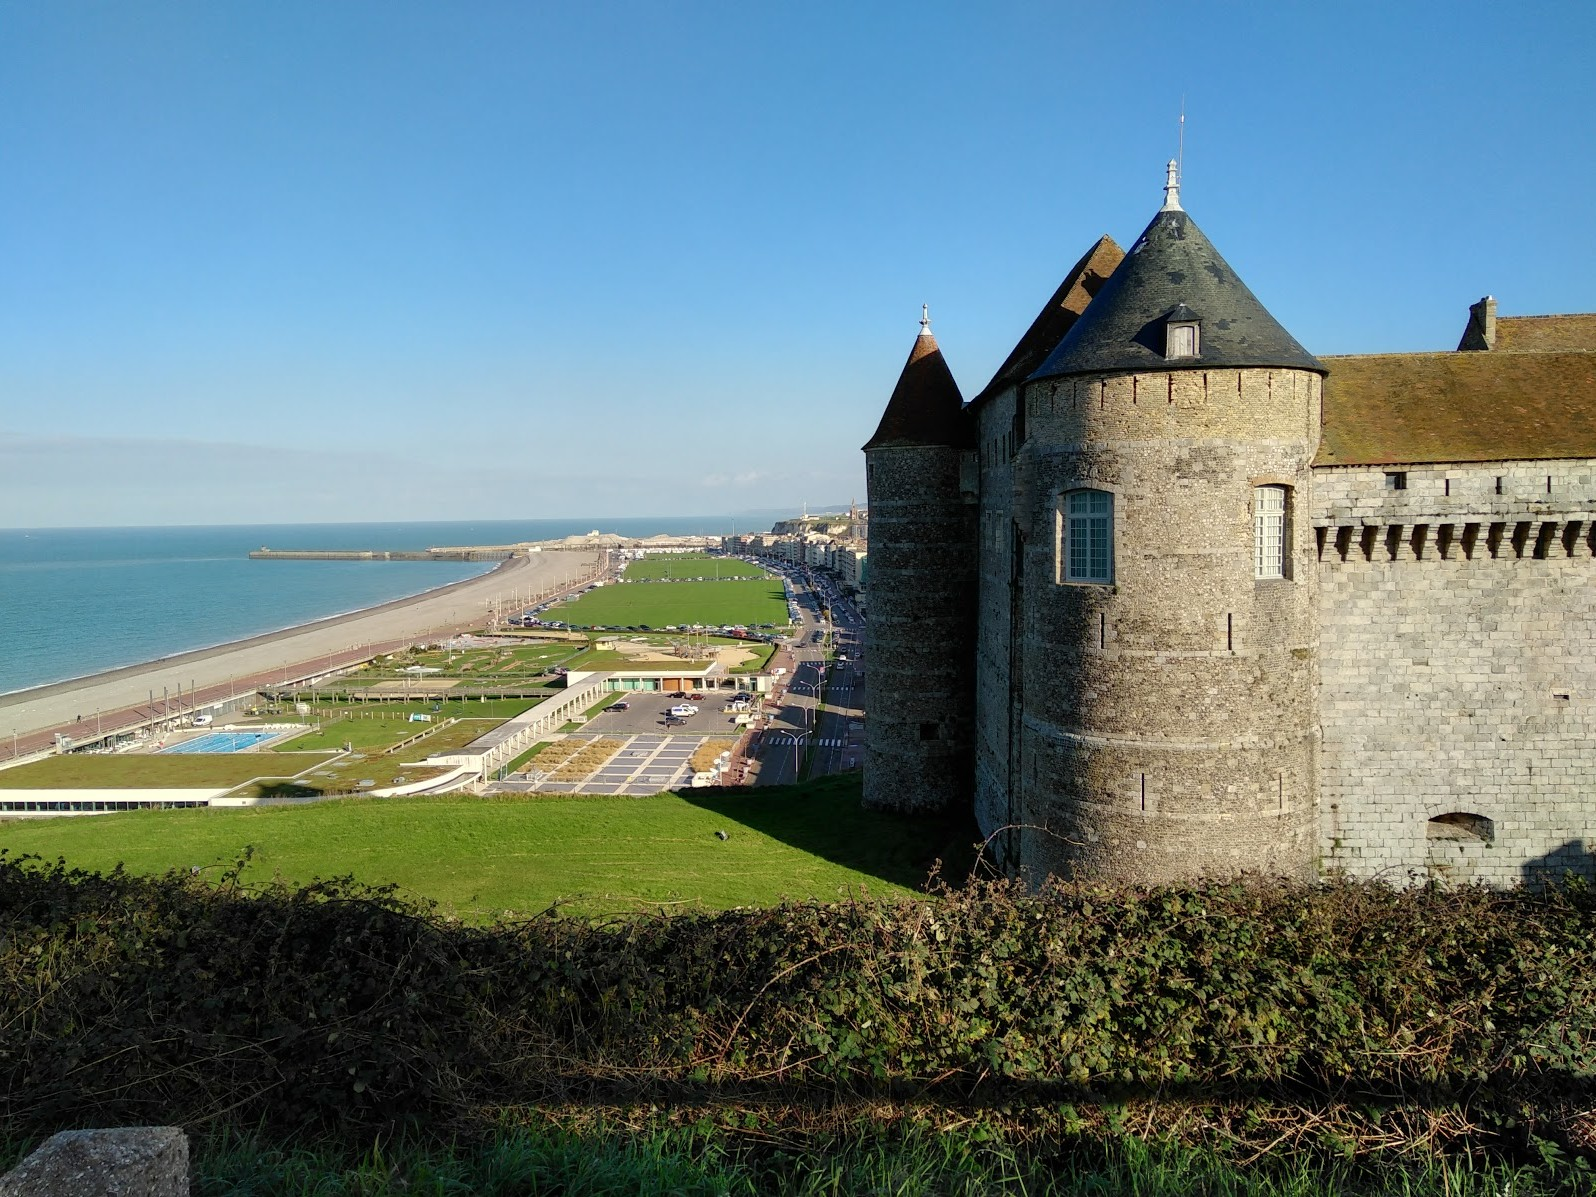 Château-Musée-de-Dieppe